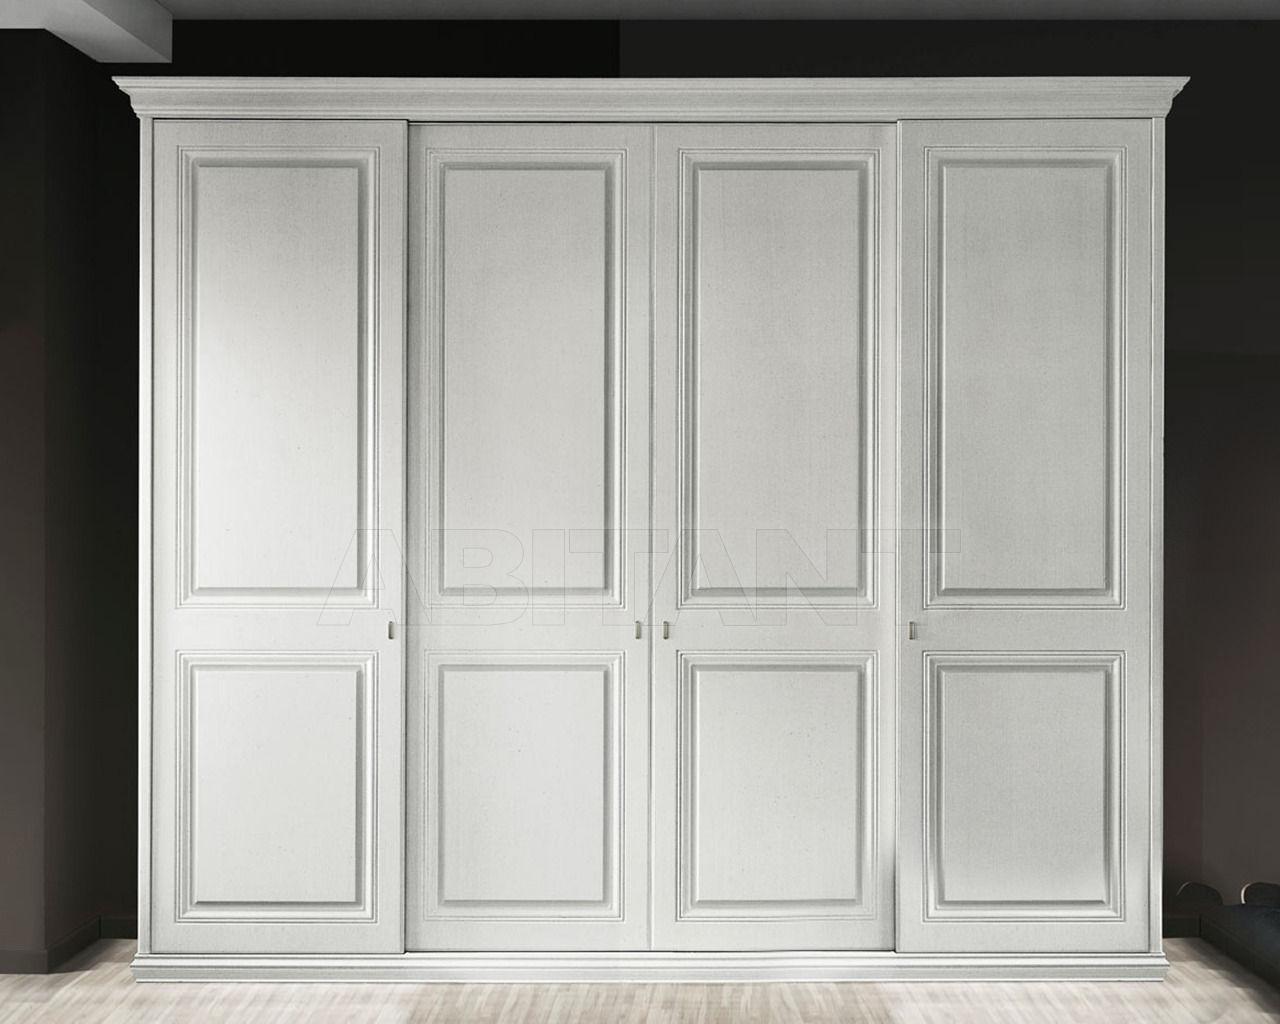 Купить Шкаф гардеробный ASSISI Cenedese Classico 3610